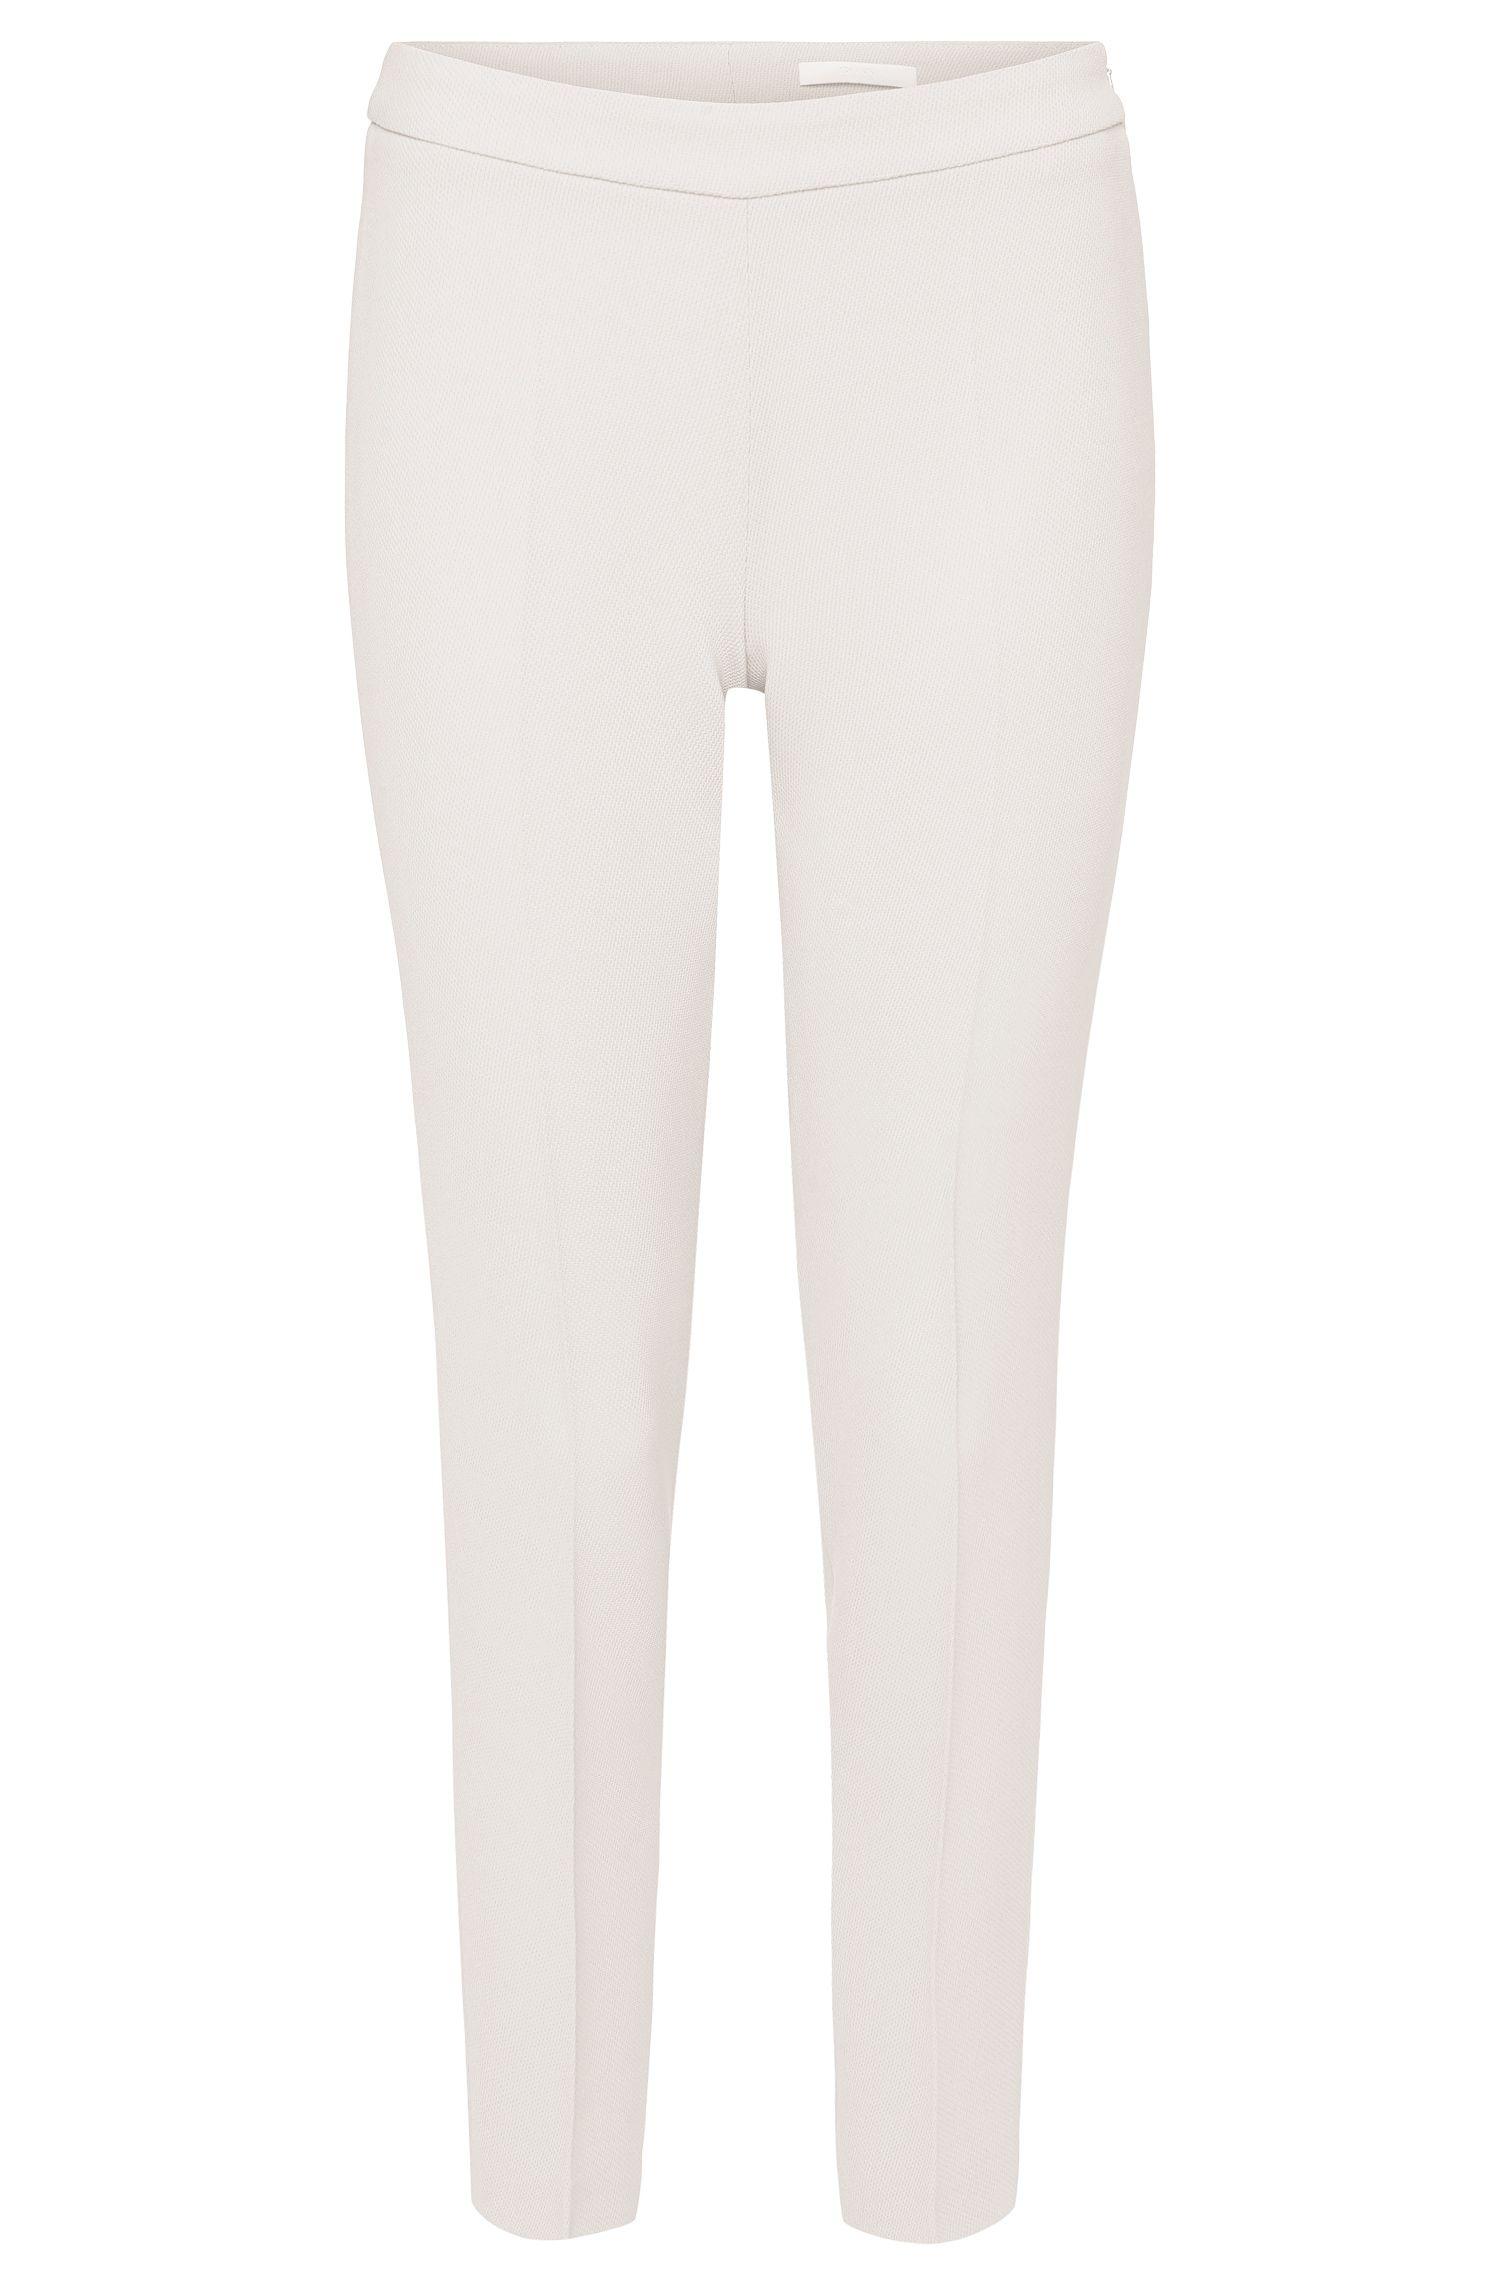 'Tiluna_Sidezip' | Textured Traictetate Blend Dress Pants